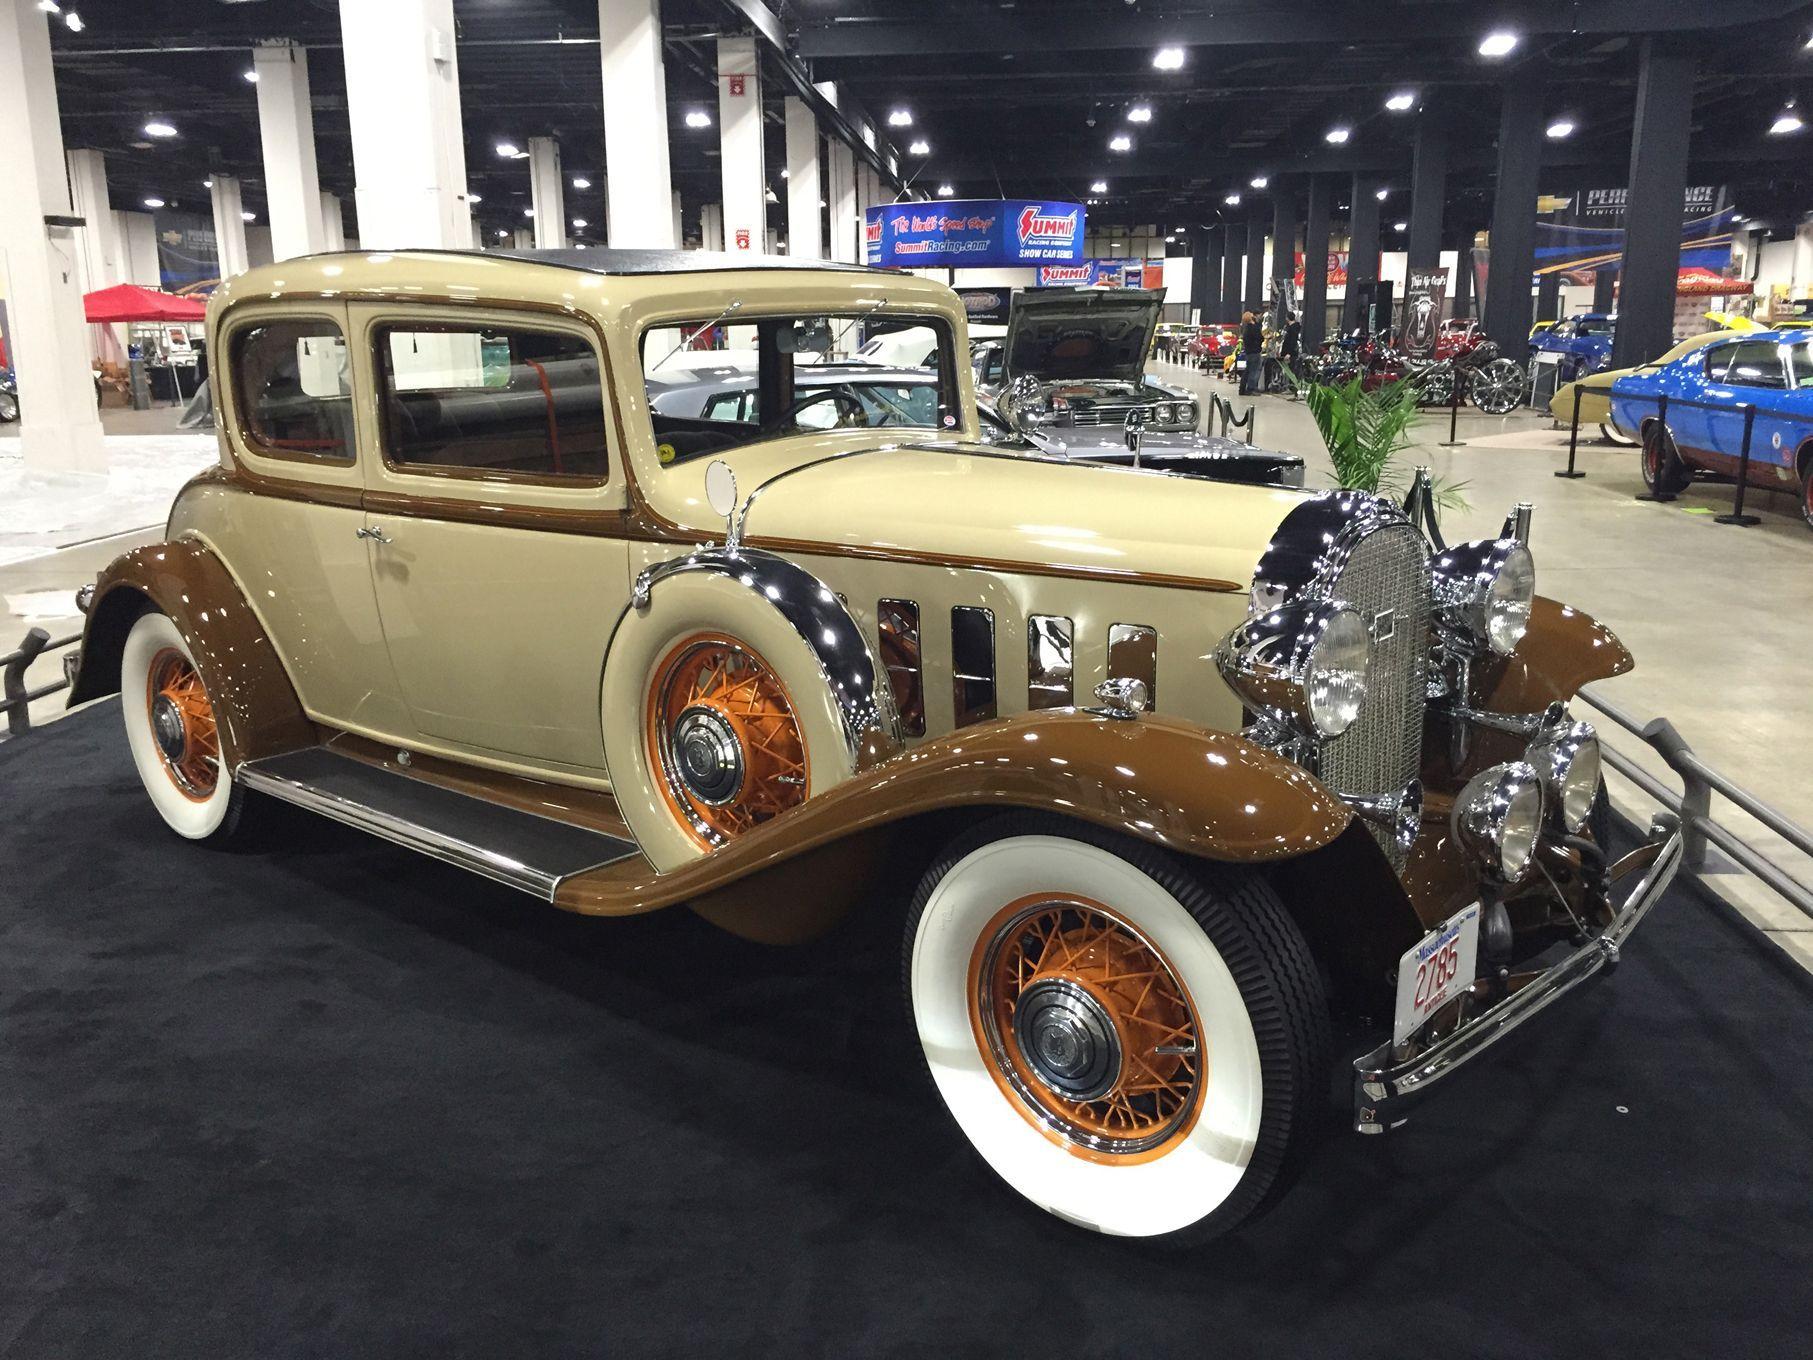 2015-boston-world-of-wheels-1932-buick-victoria-coupe.jpg (1813×1360 ...